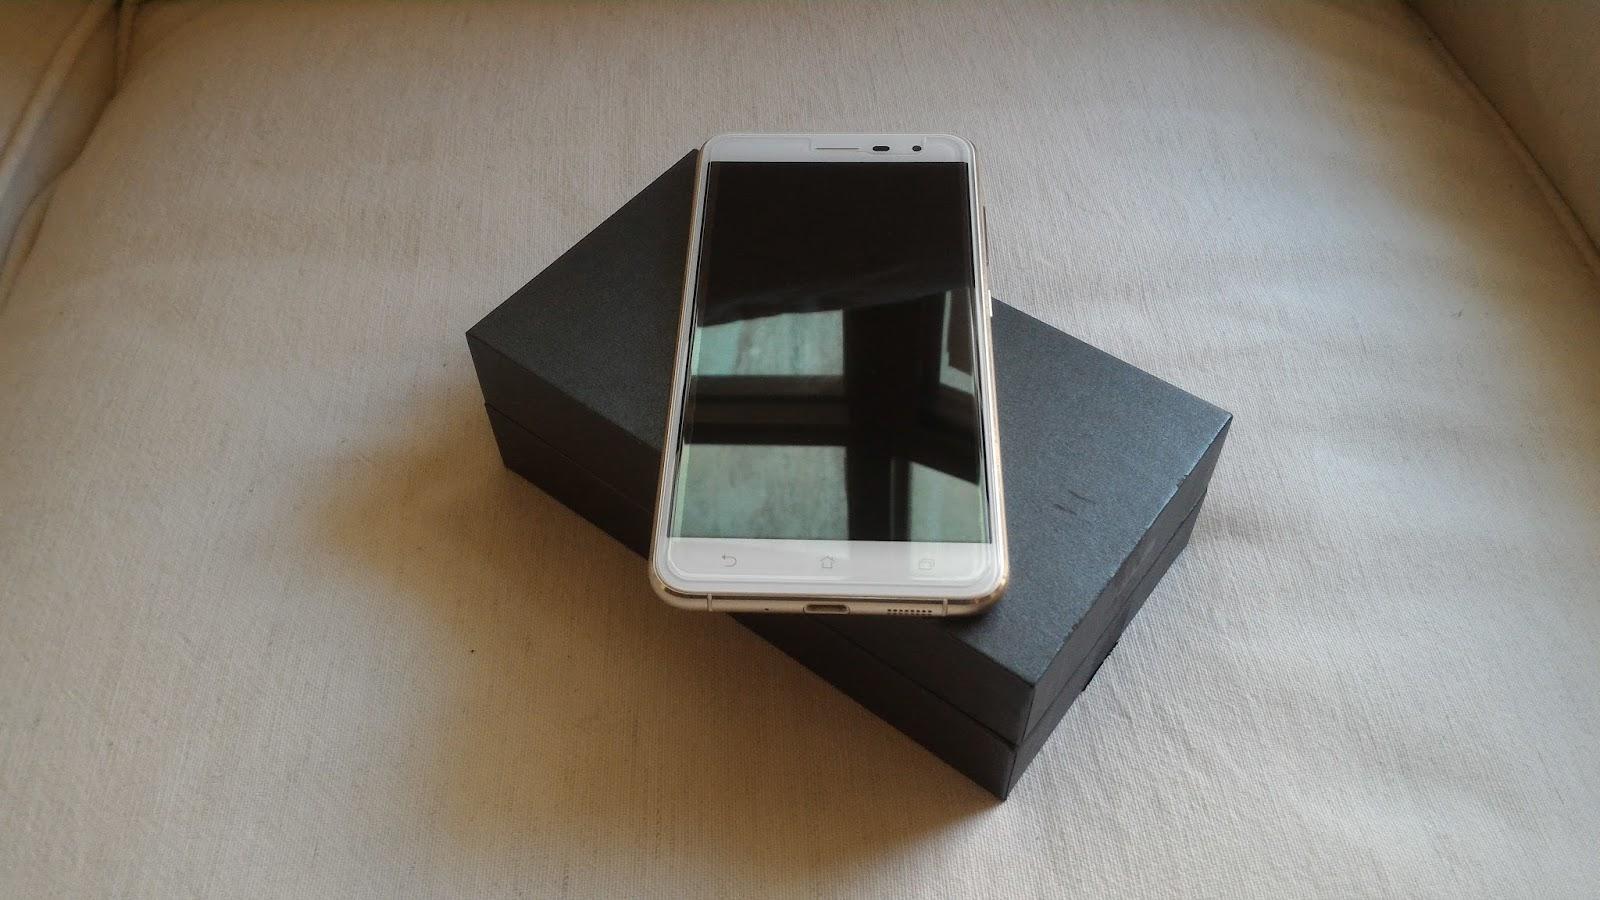 P 20170126 162018 - [開箱] 平價奢華 Zenfone 3 ZE552KL 月光白 4G/64G,外型大進化、CP值破表!